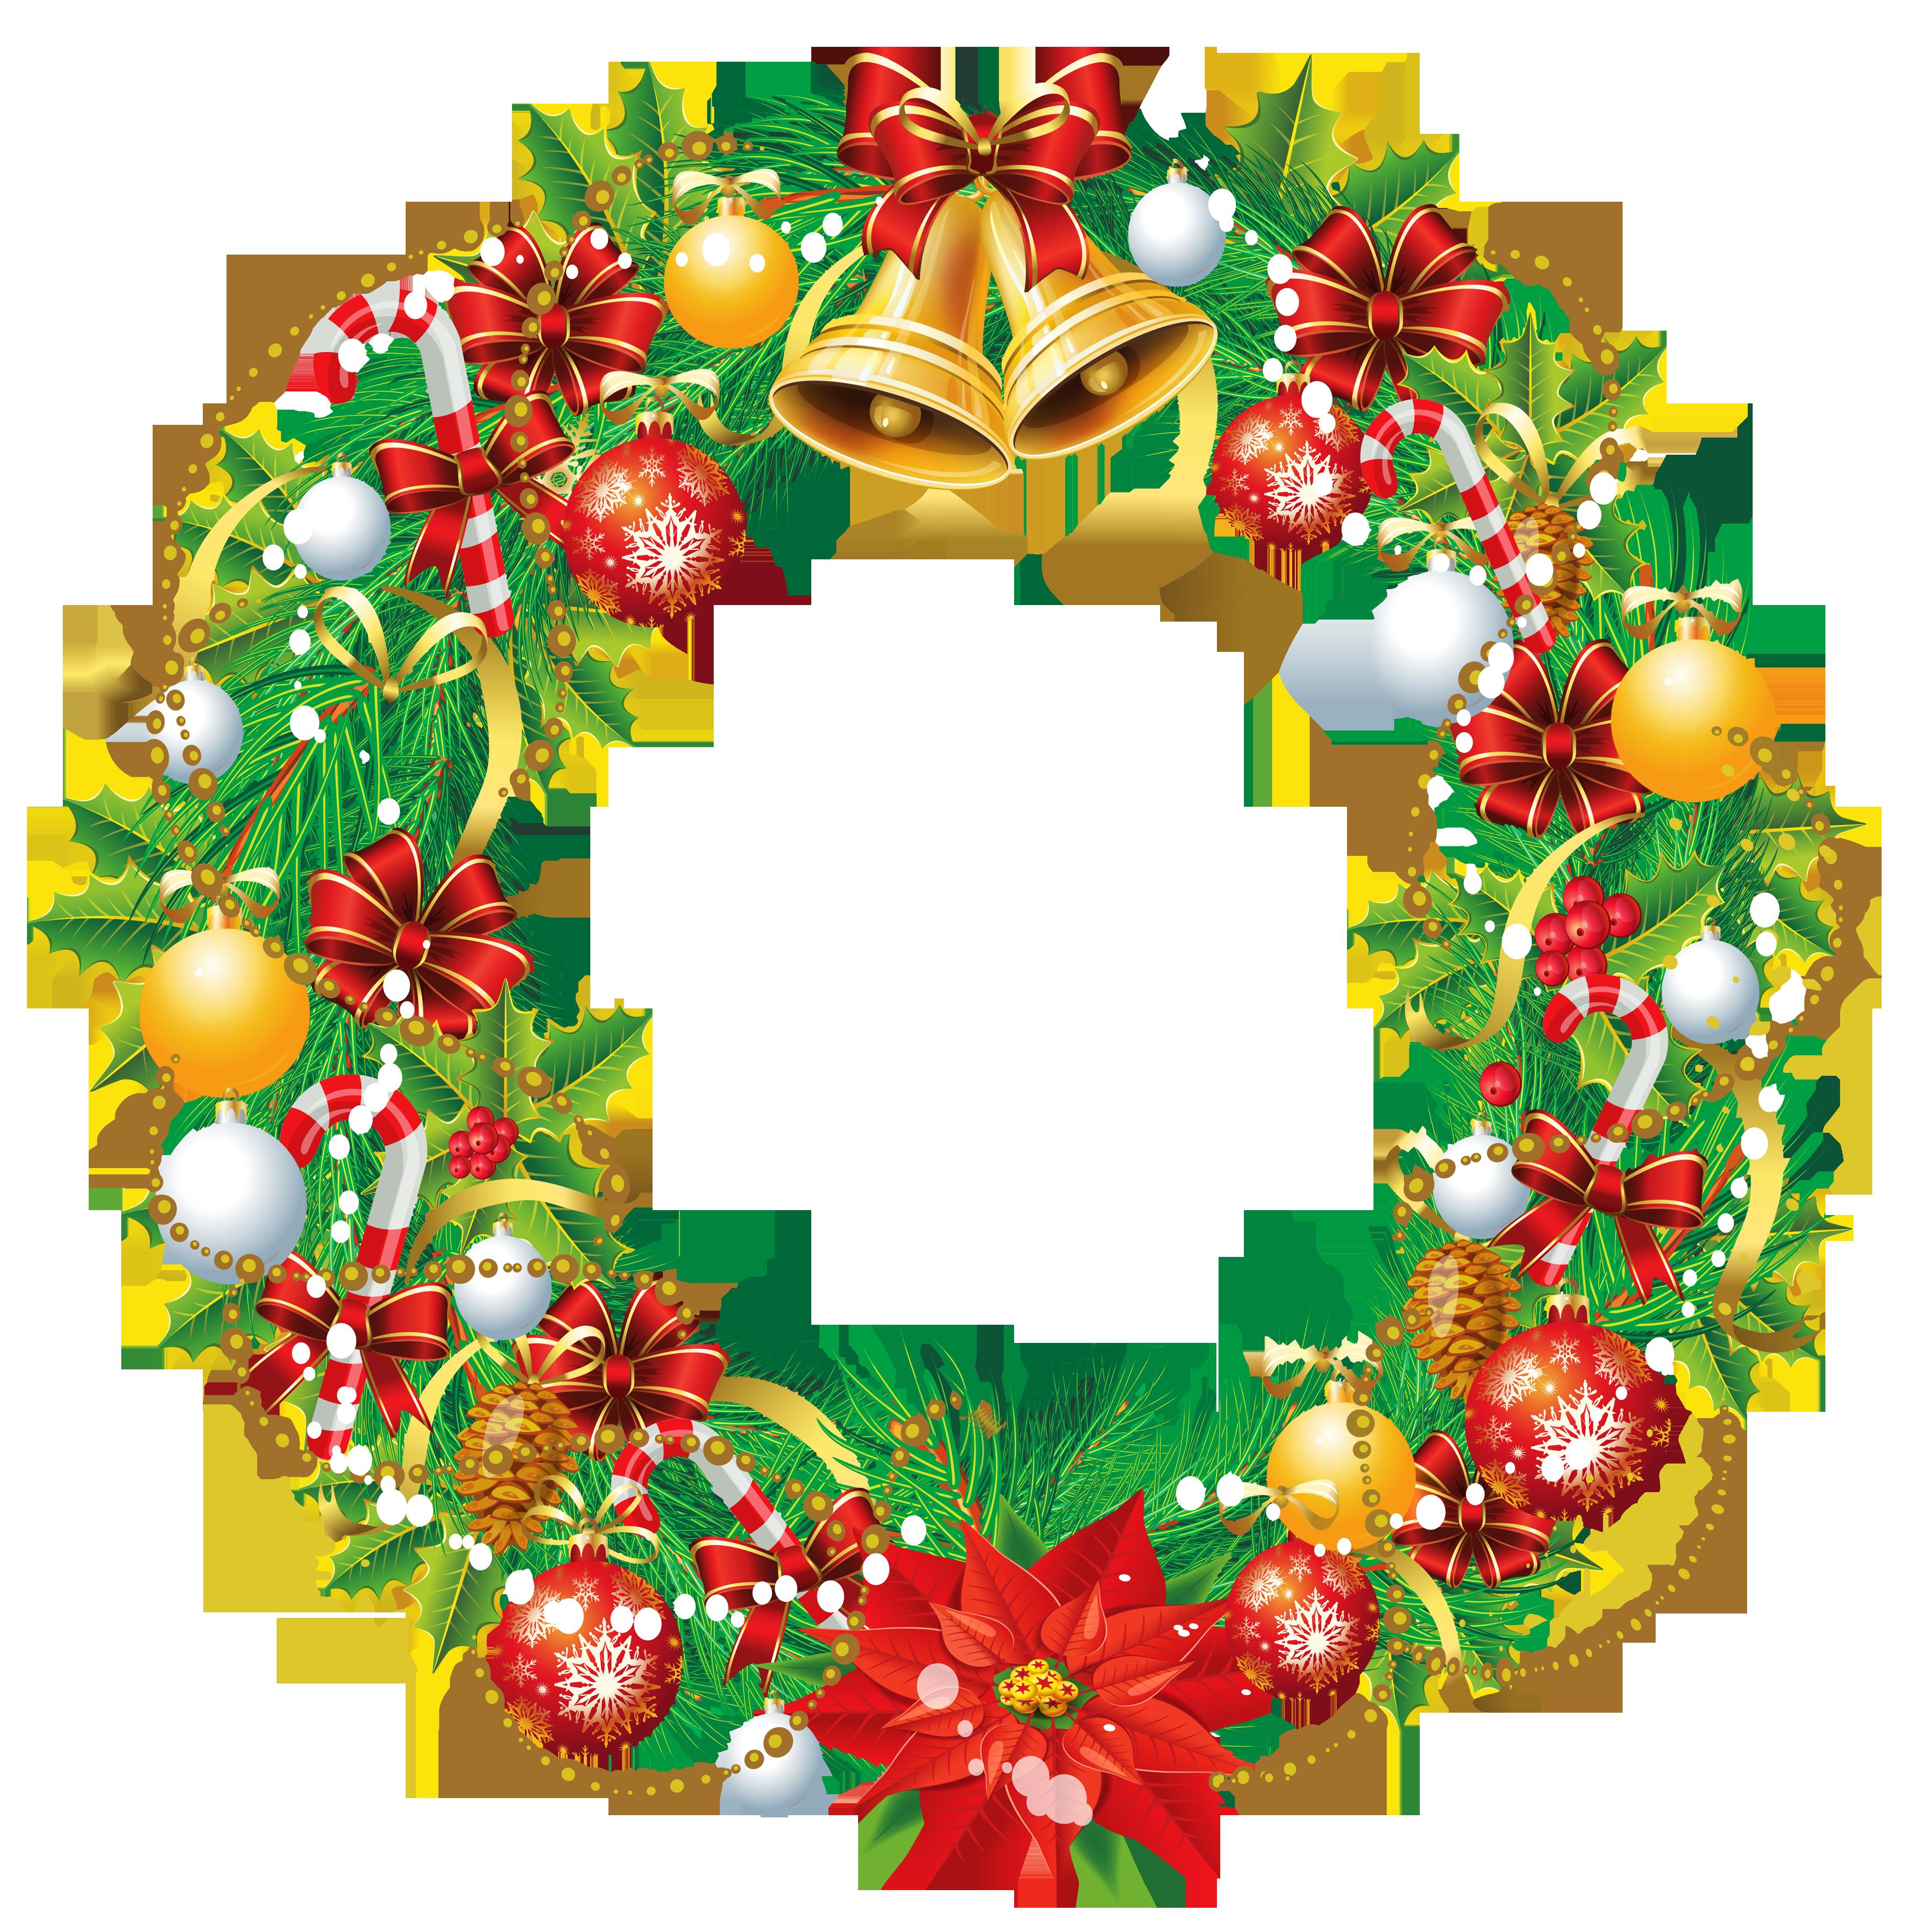 3500x3506 Transparent Christmas Wreath Png Clipart Pictureu200b Gallery